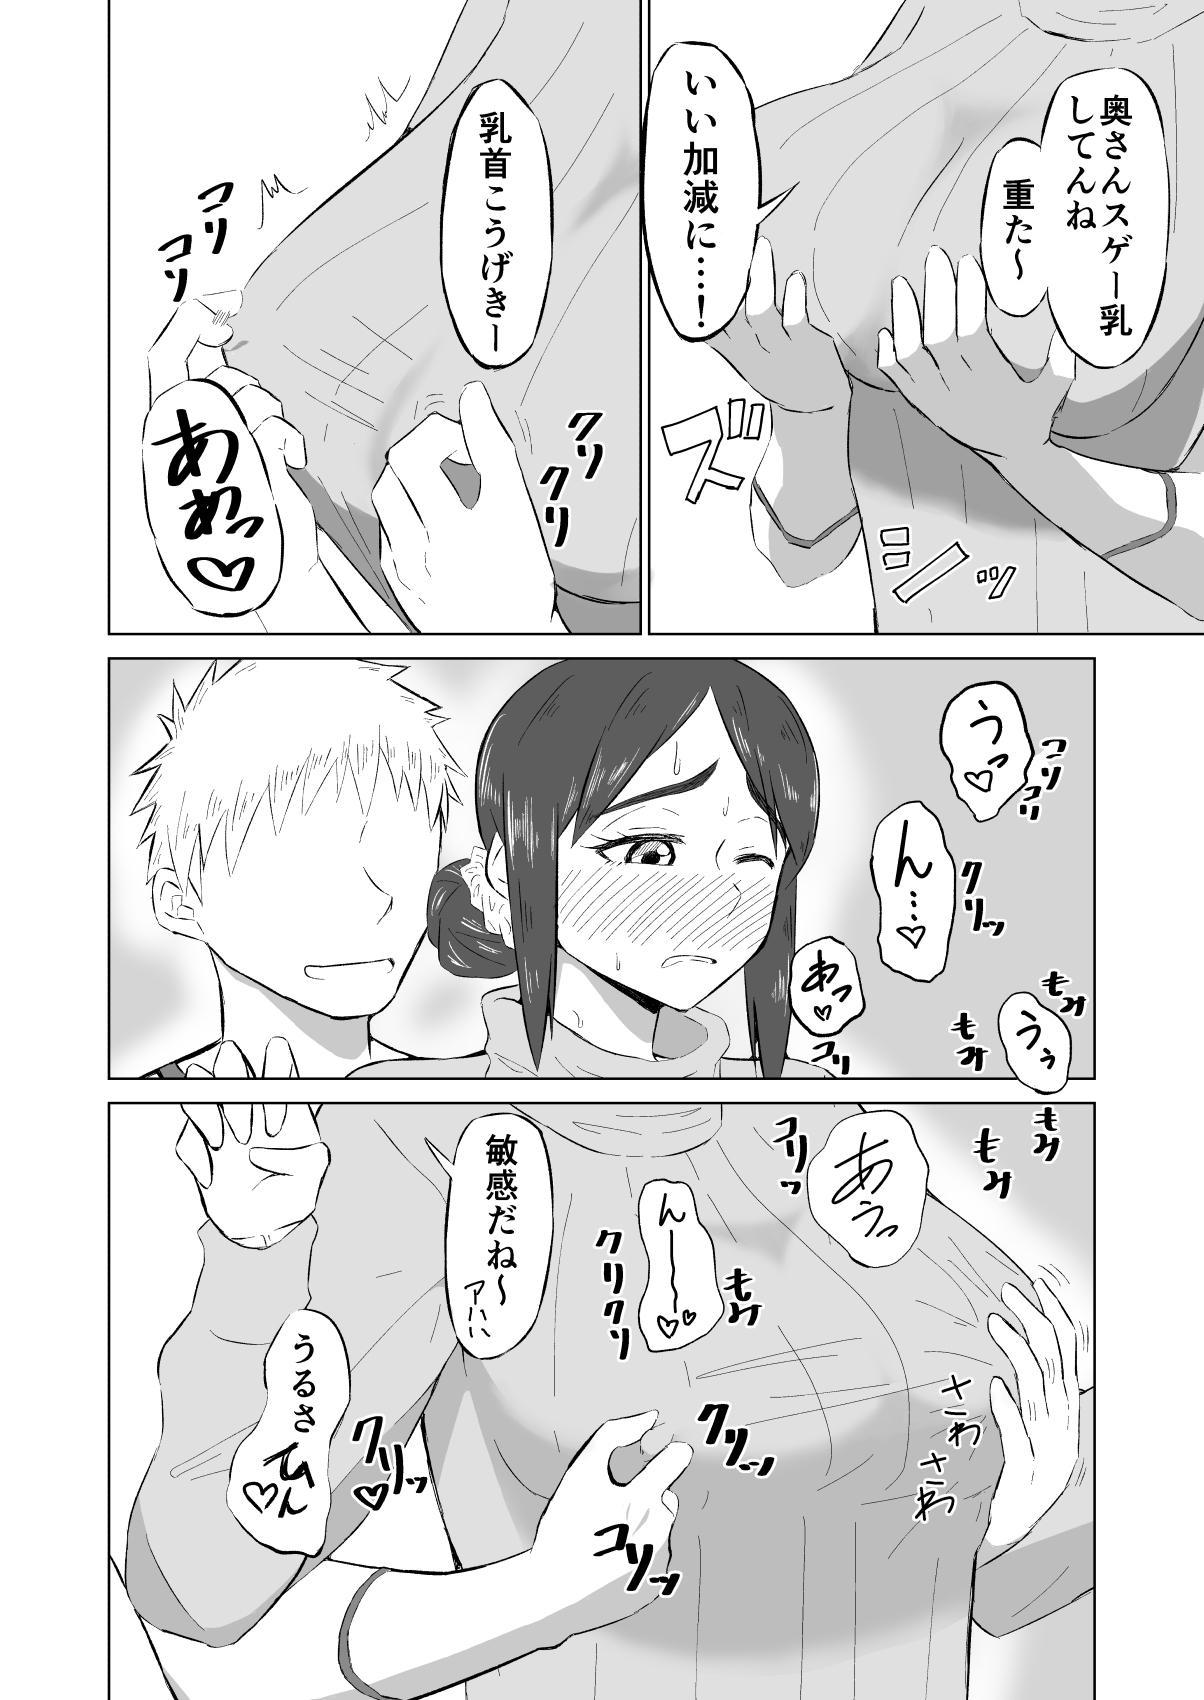 Hitozuma ga Off-kai de Omochikaerare Hon 5